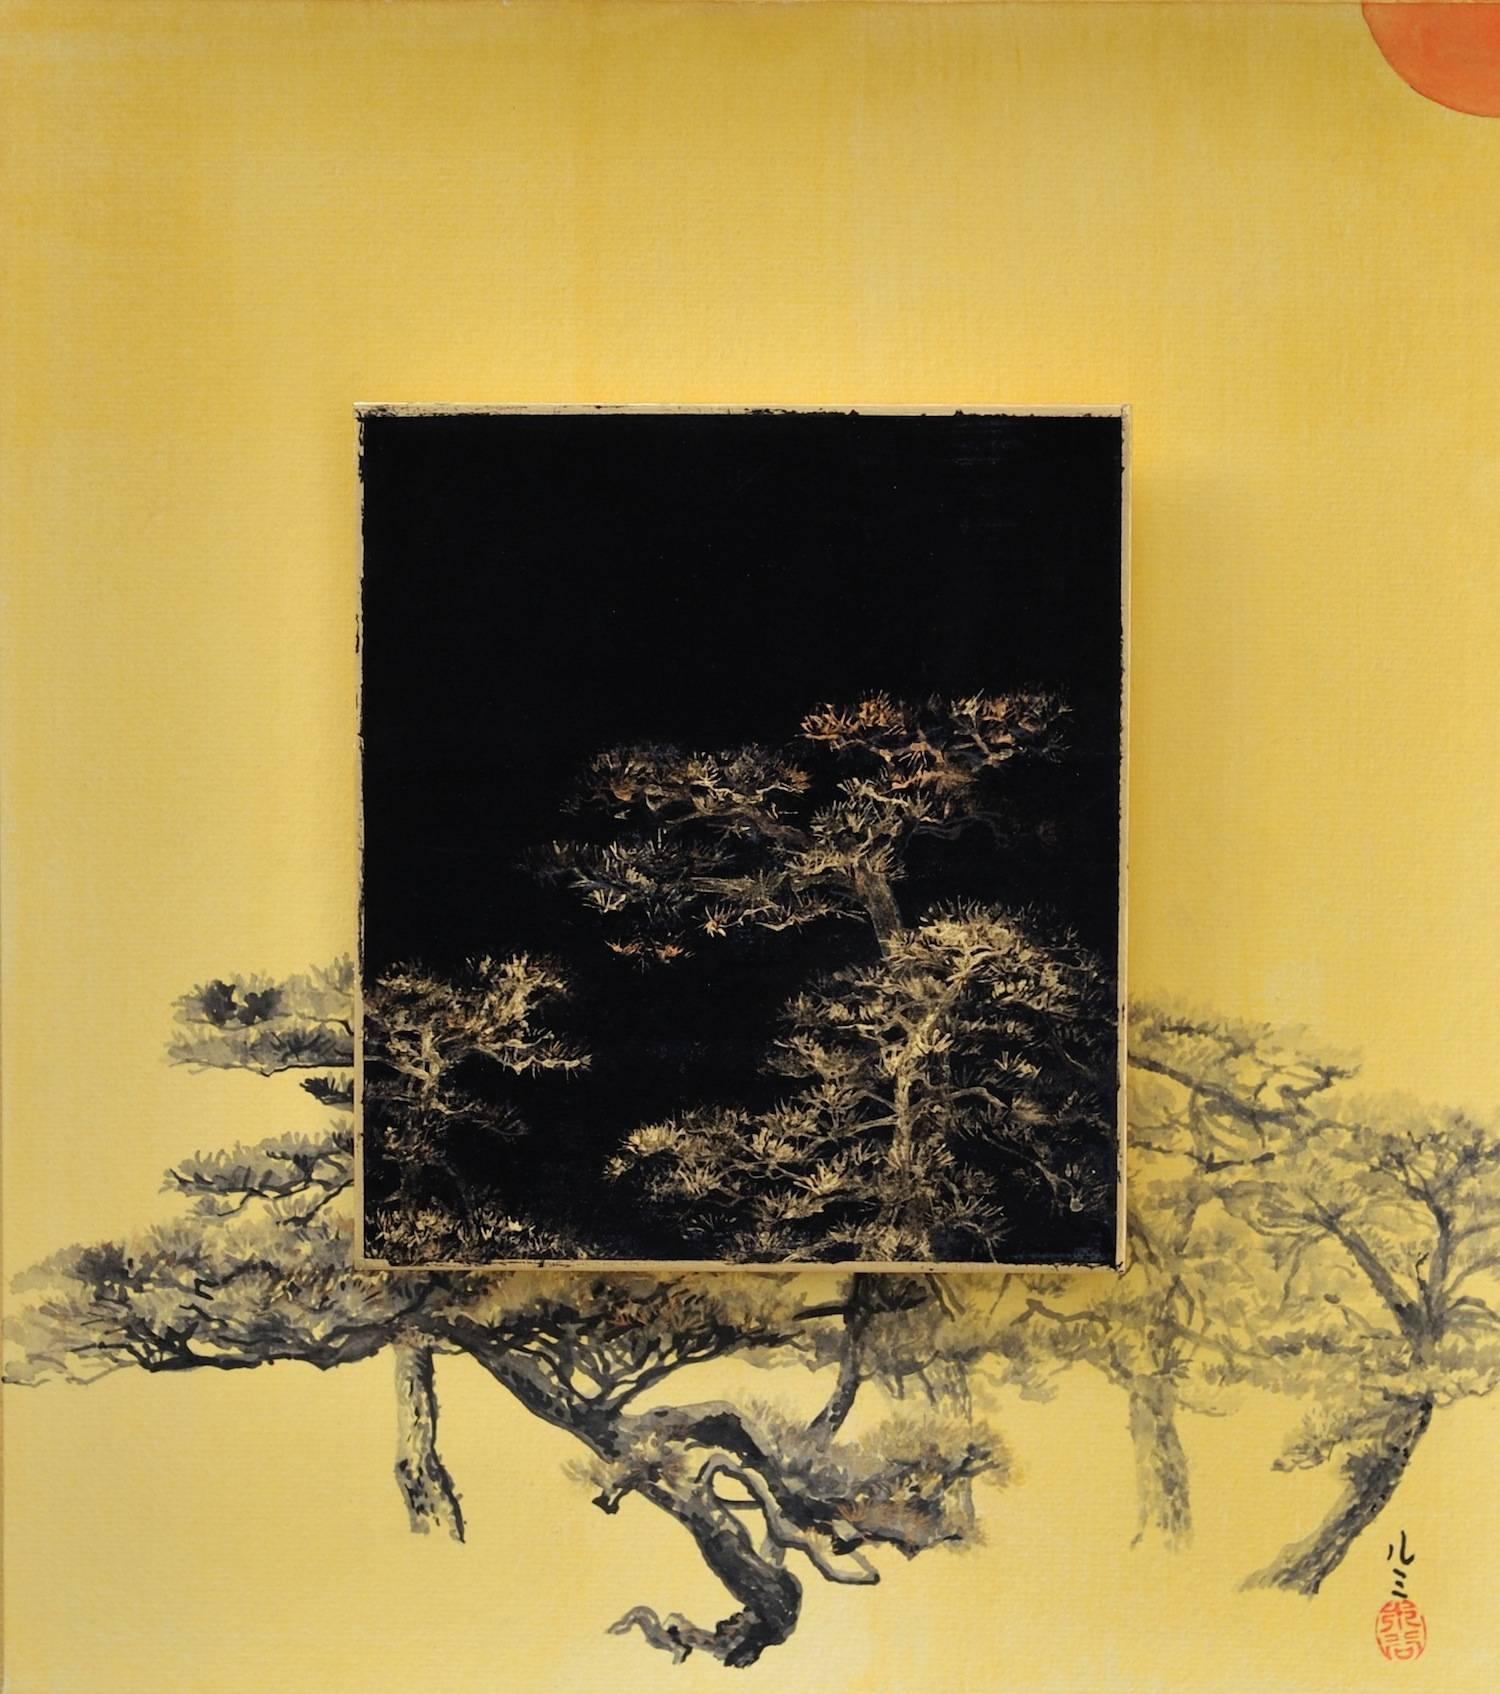 Lumi Mizutani - Day and Night - Pine tree, Painting For Sale at 1stdibs